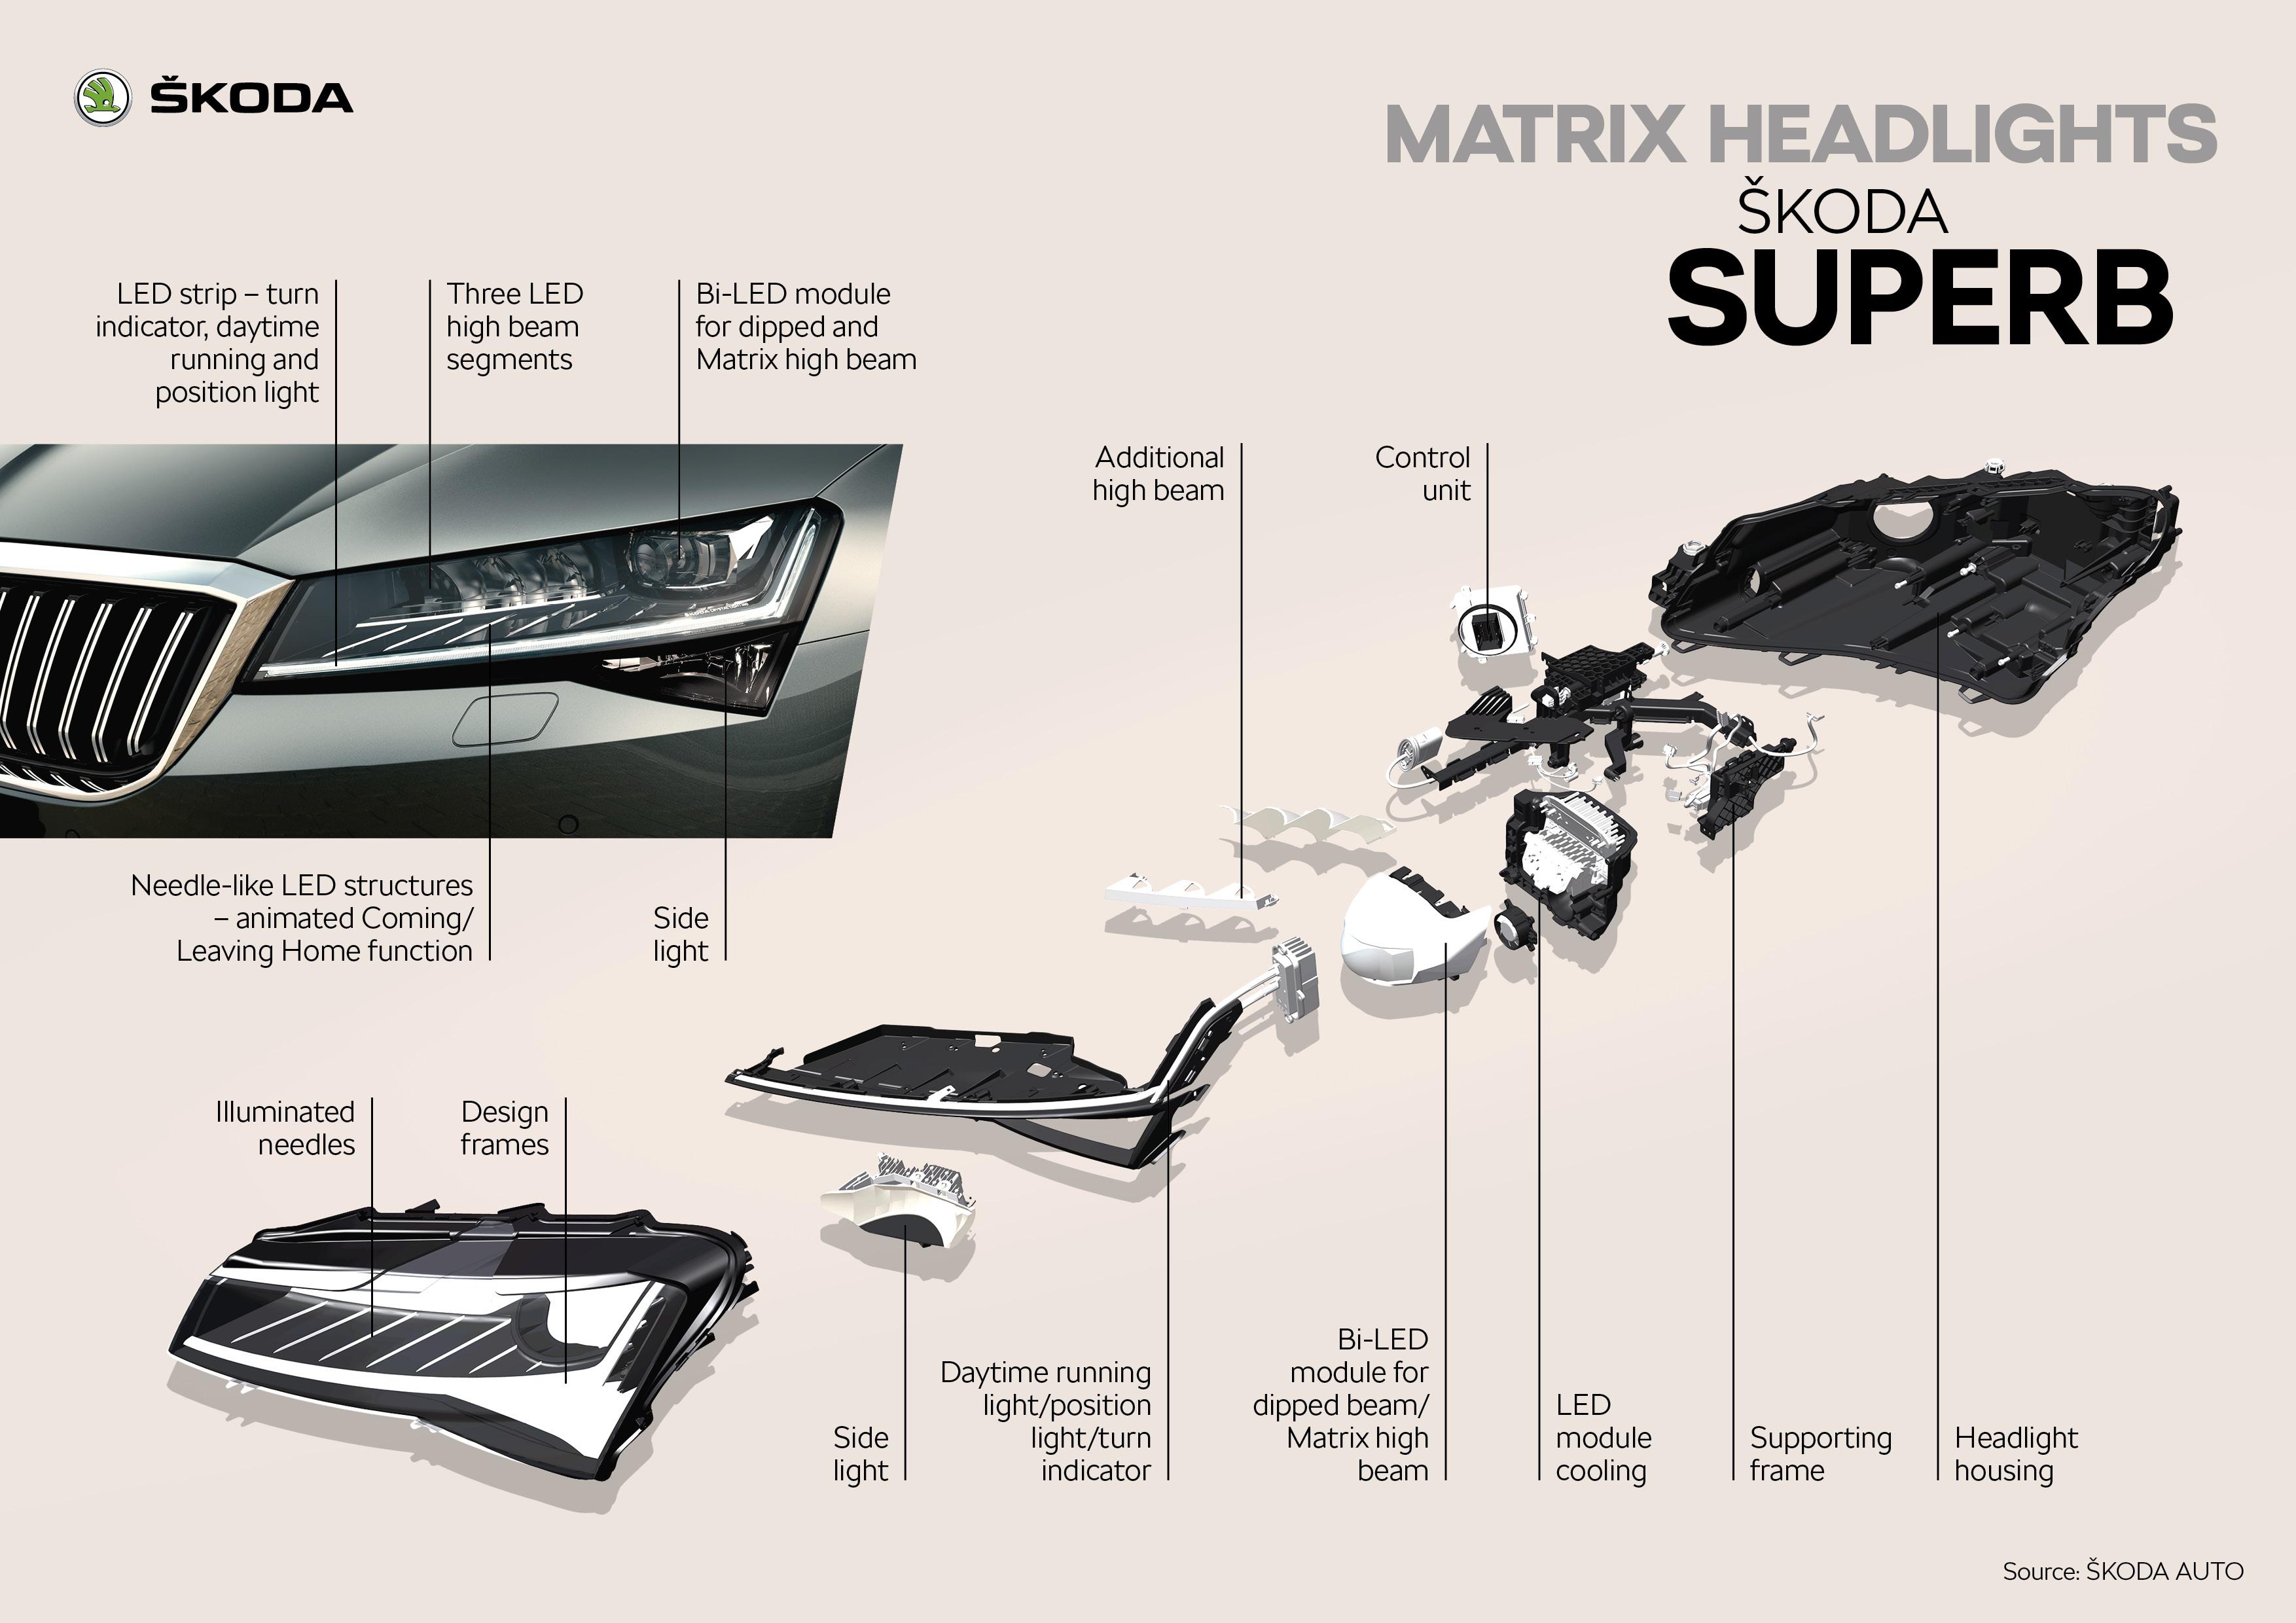 ŠKODA SUPERB Matrix headlights.